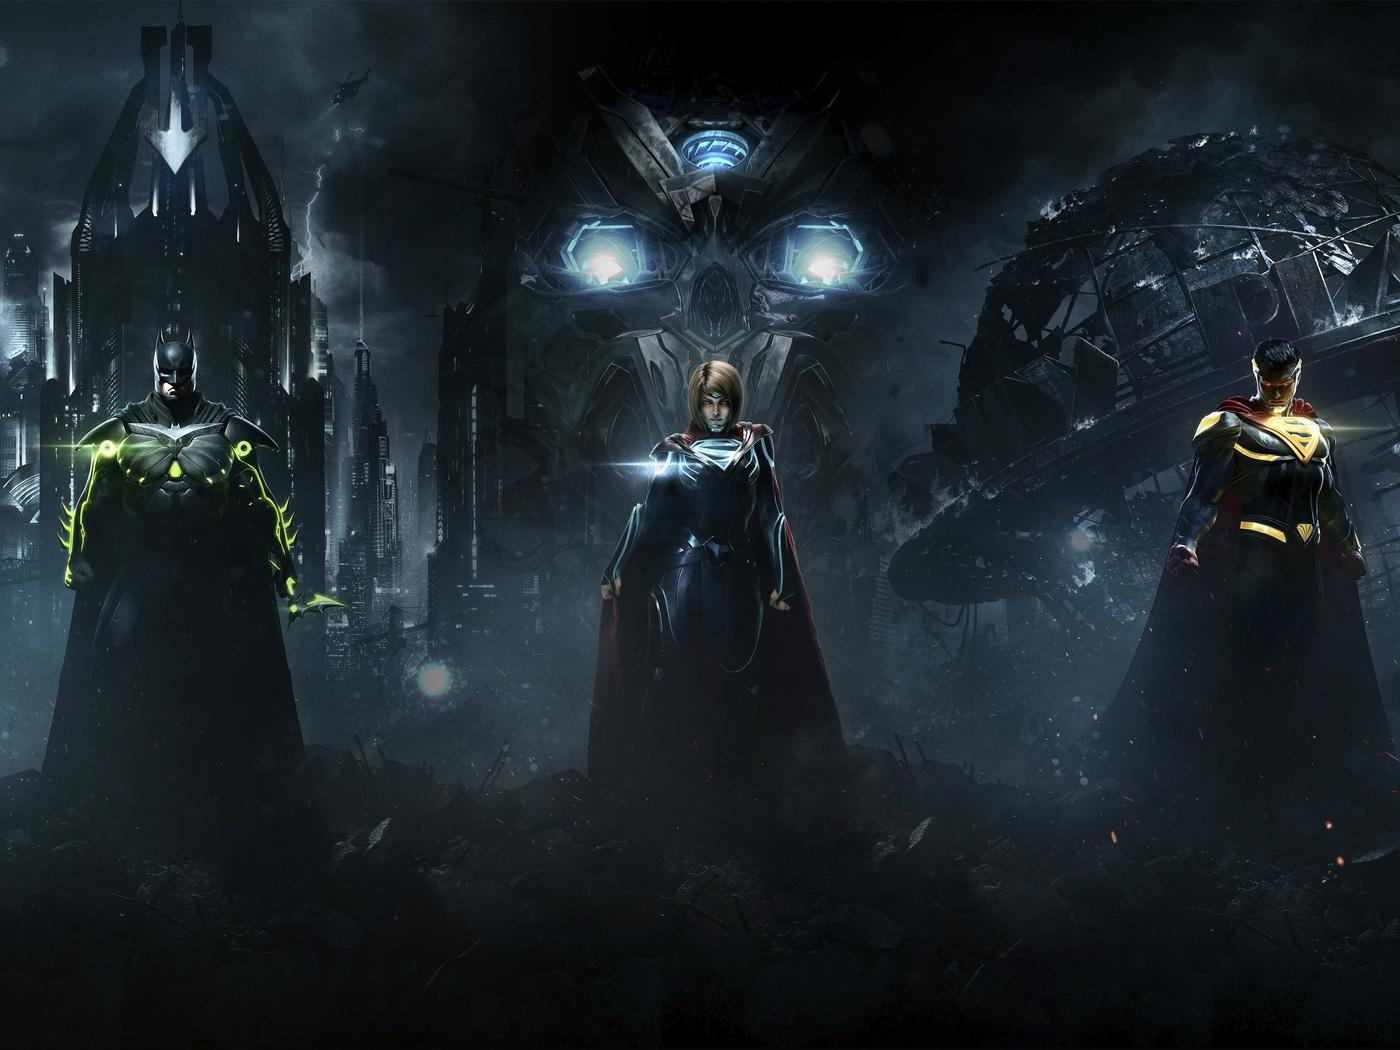 Injustice 2 Superman Hd Games 4k Wallpapers Images: 1400x1050 Injustice 2 Superman Supergirl Batman Combine 4k